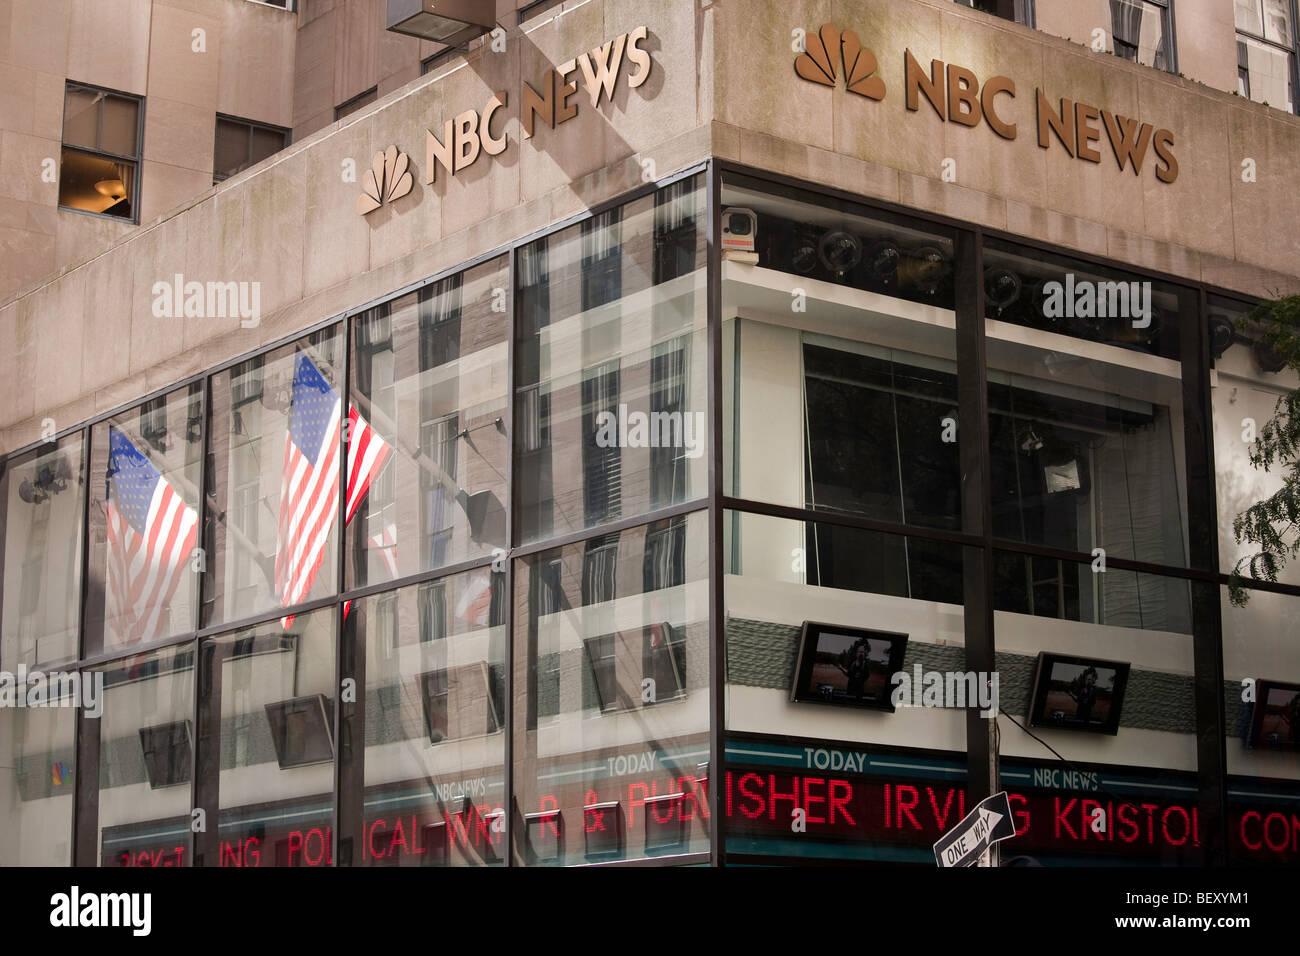 Nbc News Rockefeller Center In New York City Stock Photo Alamy